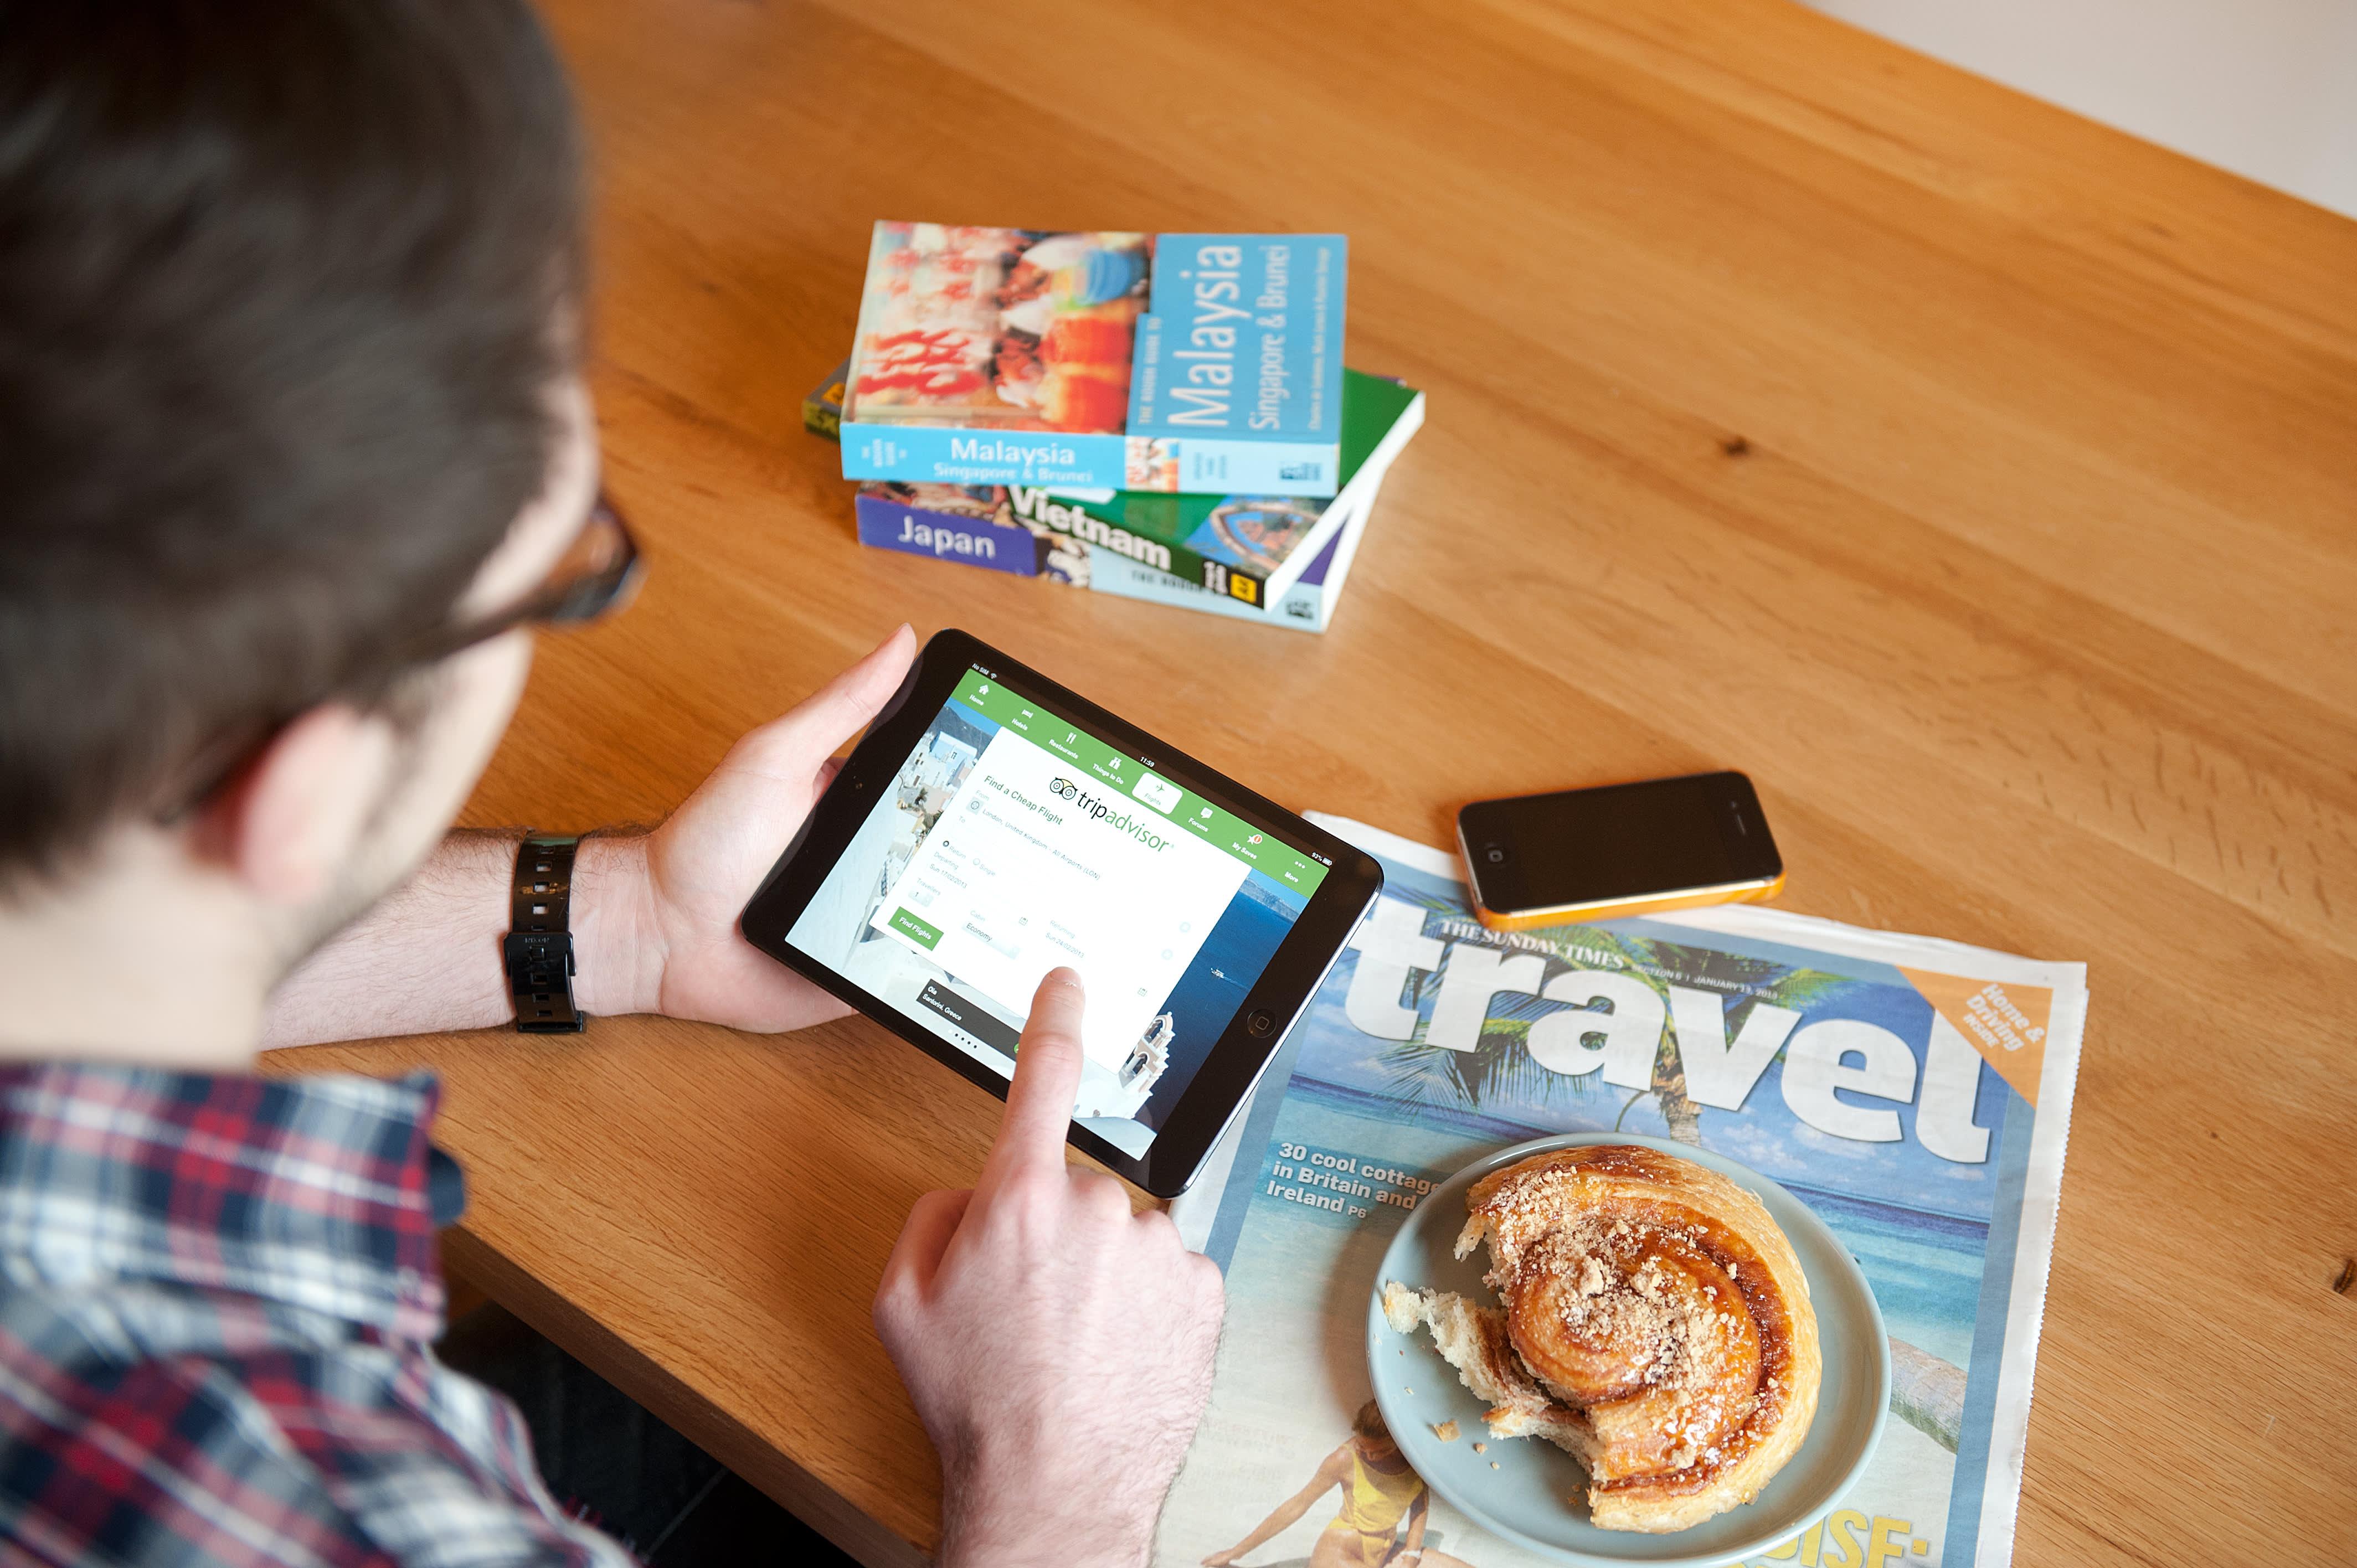 Tripadvisor launches Tripadvisor Plus subscription service